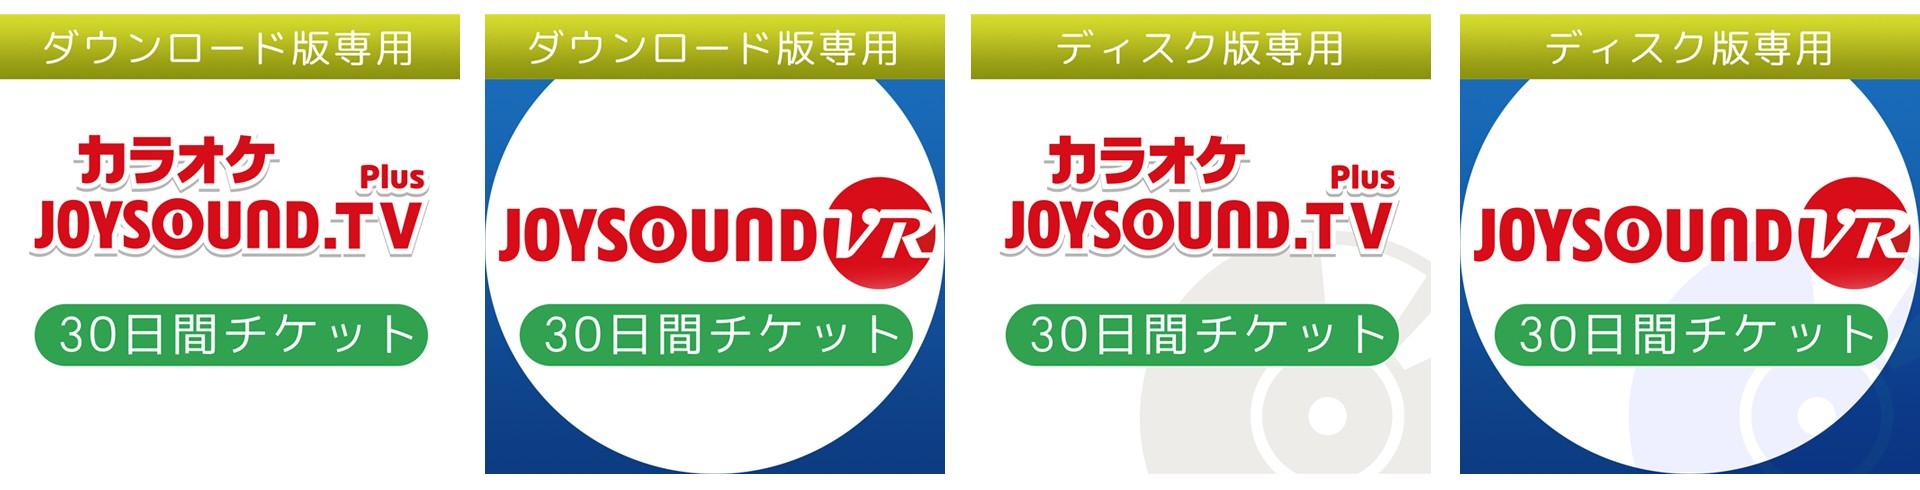 JOYSOUND.TV Plus_body_5